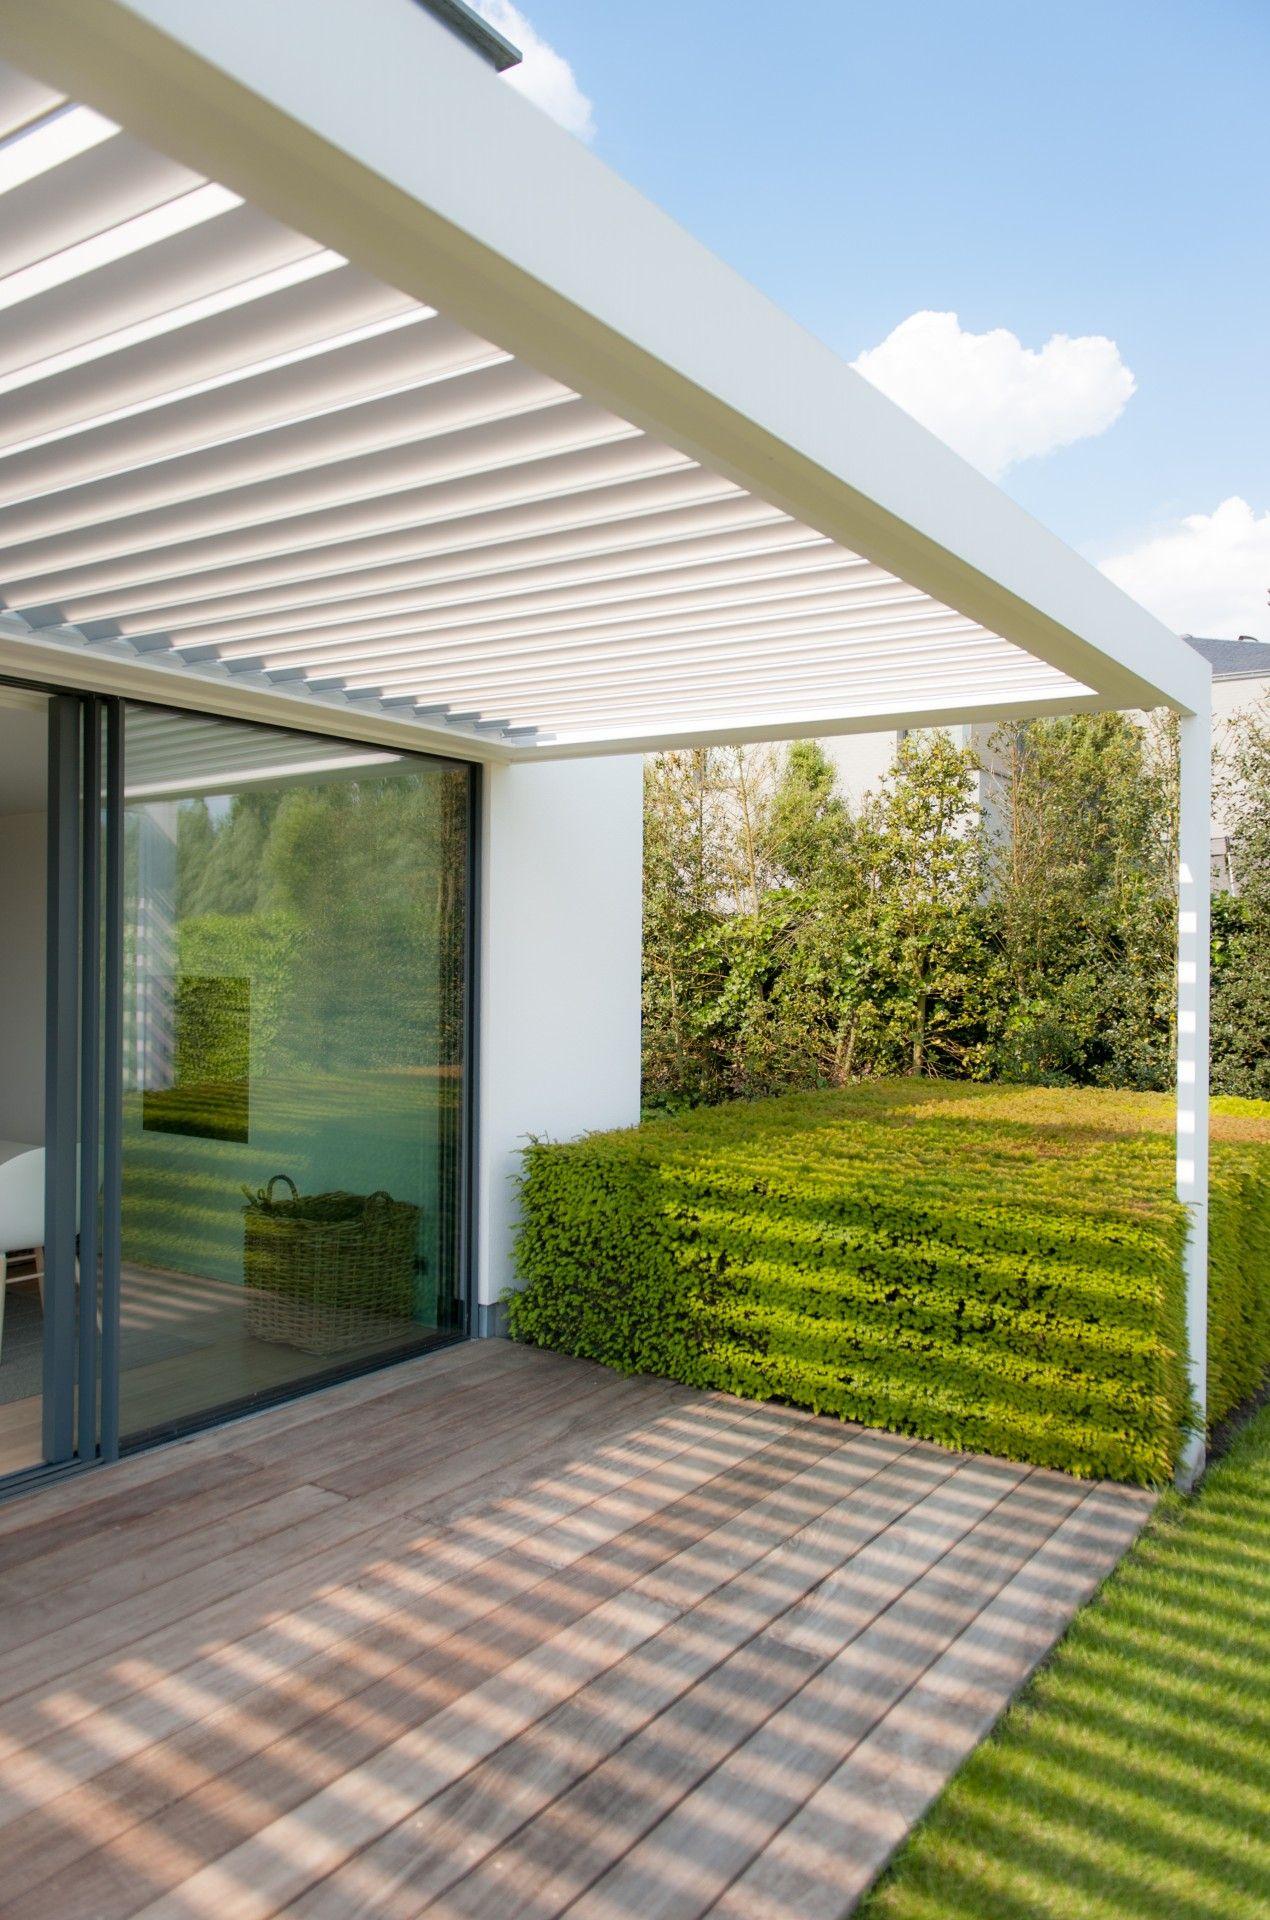 Photos De Verandas En Bois livium #louvredaken maken de terrasoverkapping of veranda